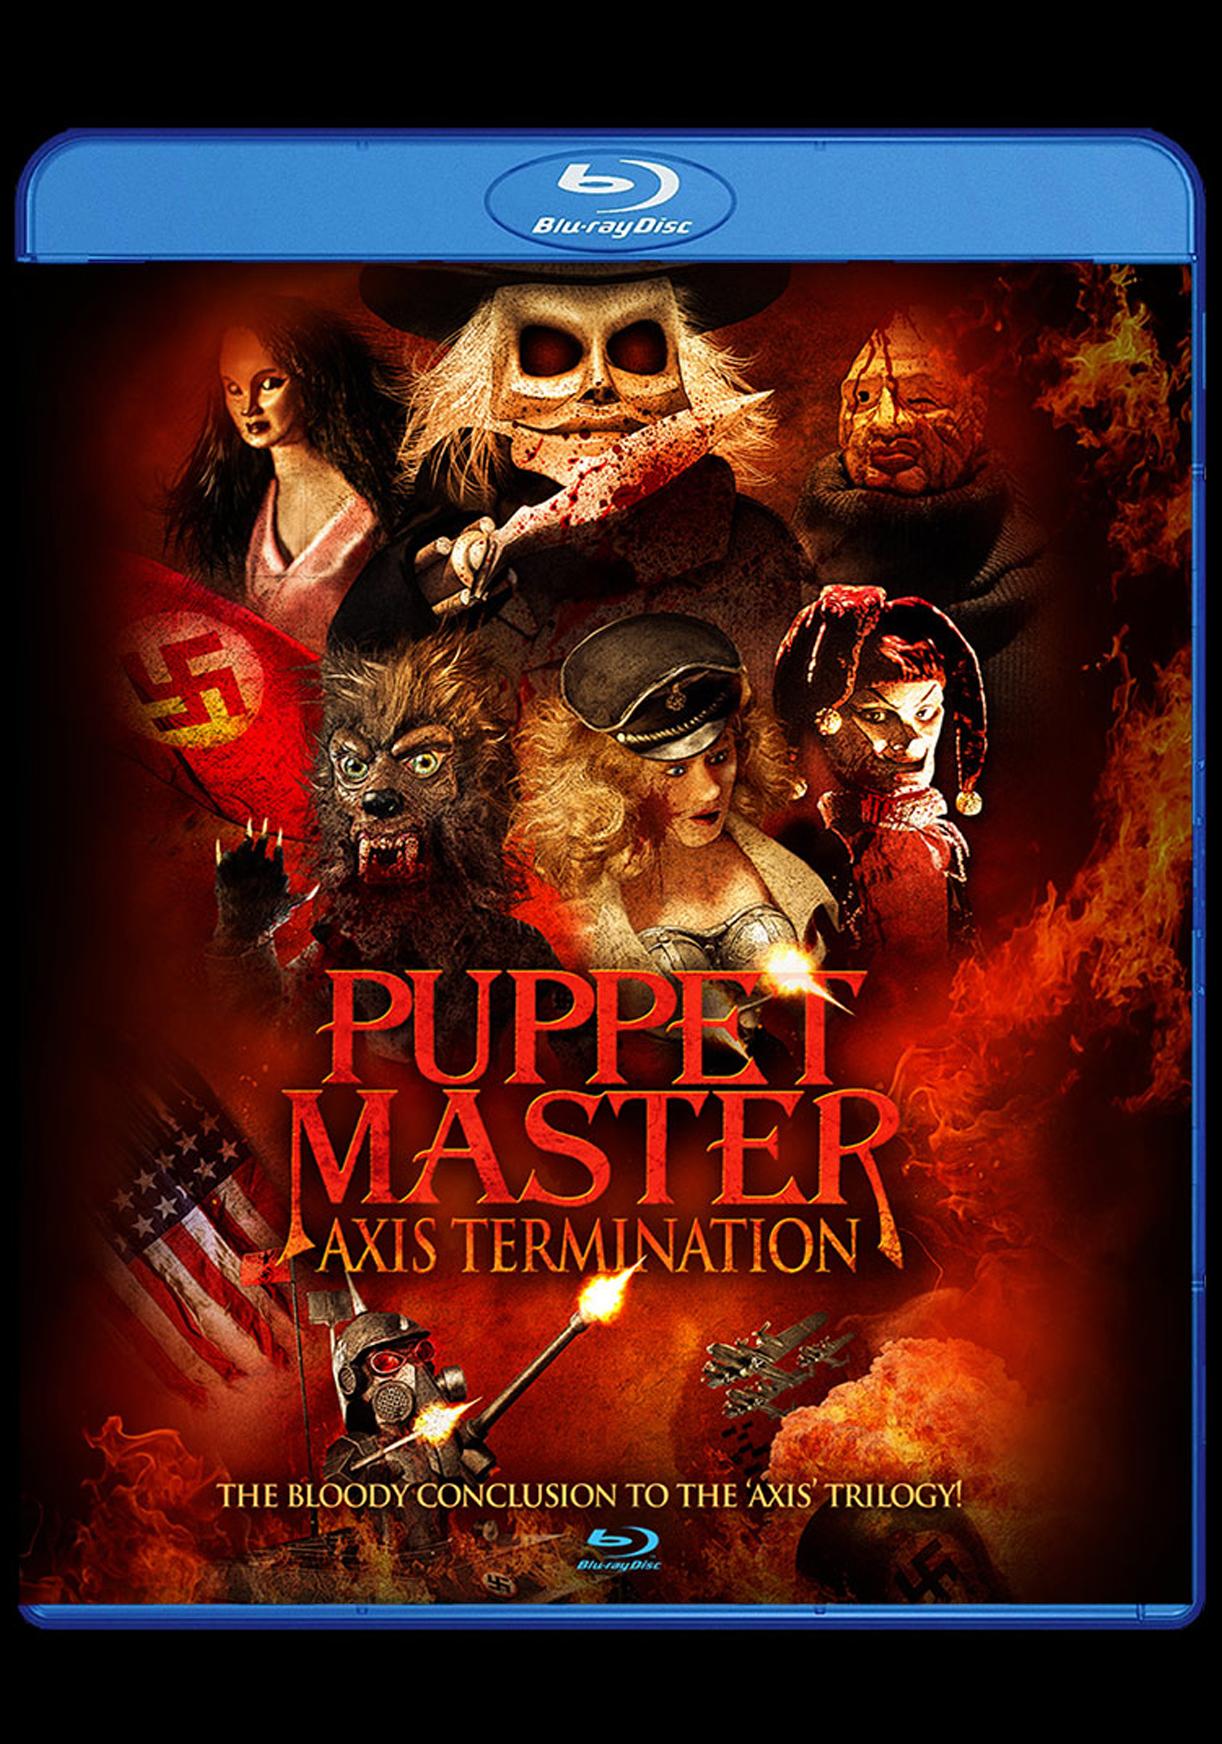 PMAxisTermination_Blu-ray_BLKBOX_750web.jpg